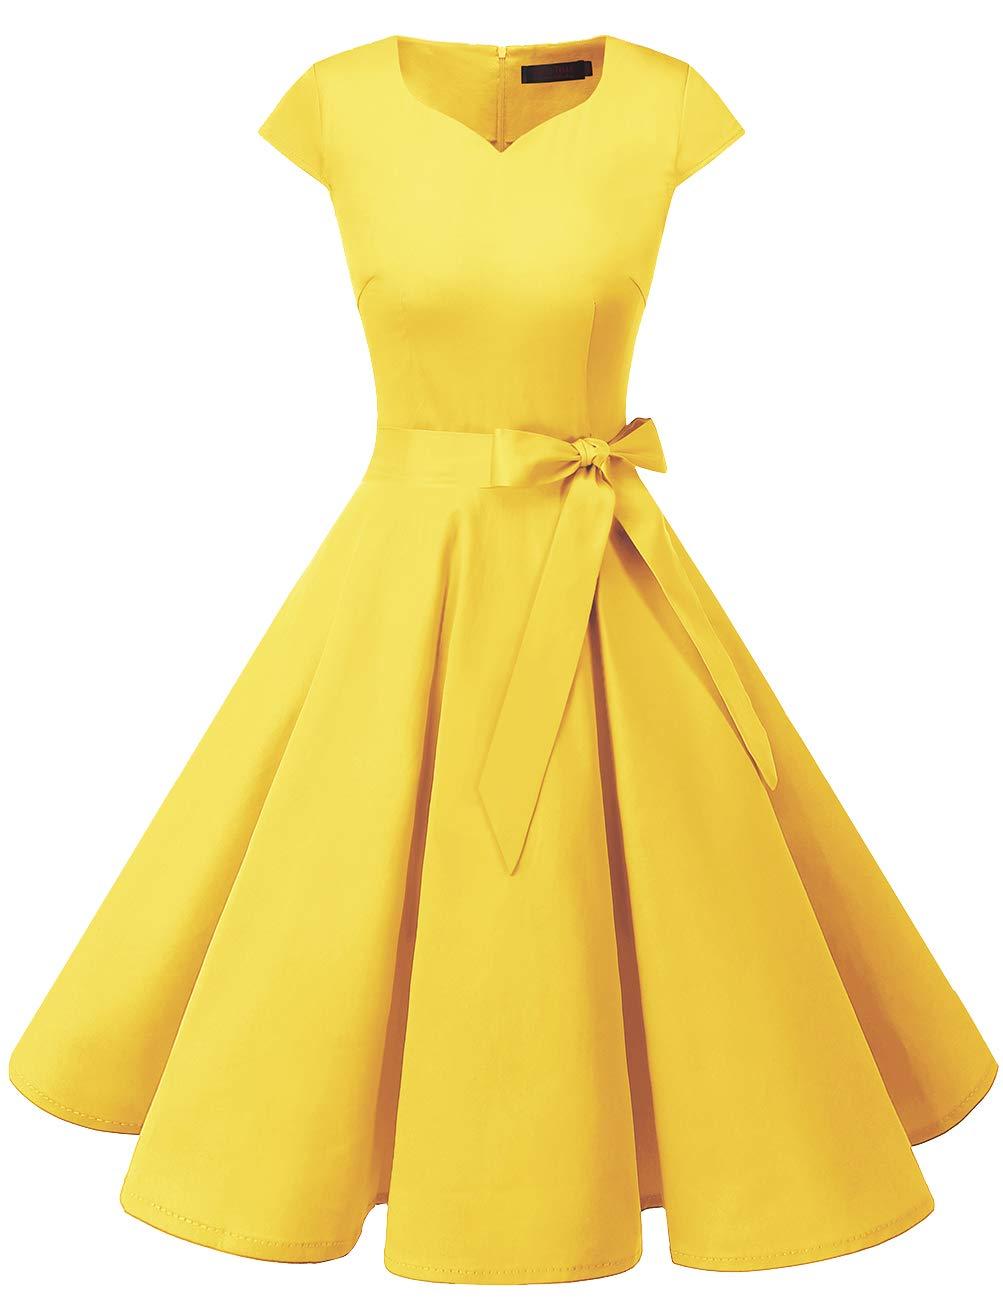 DRESSTELLS Retro 1950s Solid Color Cocktail Dresses Vintage Swing Dress with Cap-Sleeves Yelllow M by DRESSTELLS